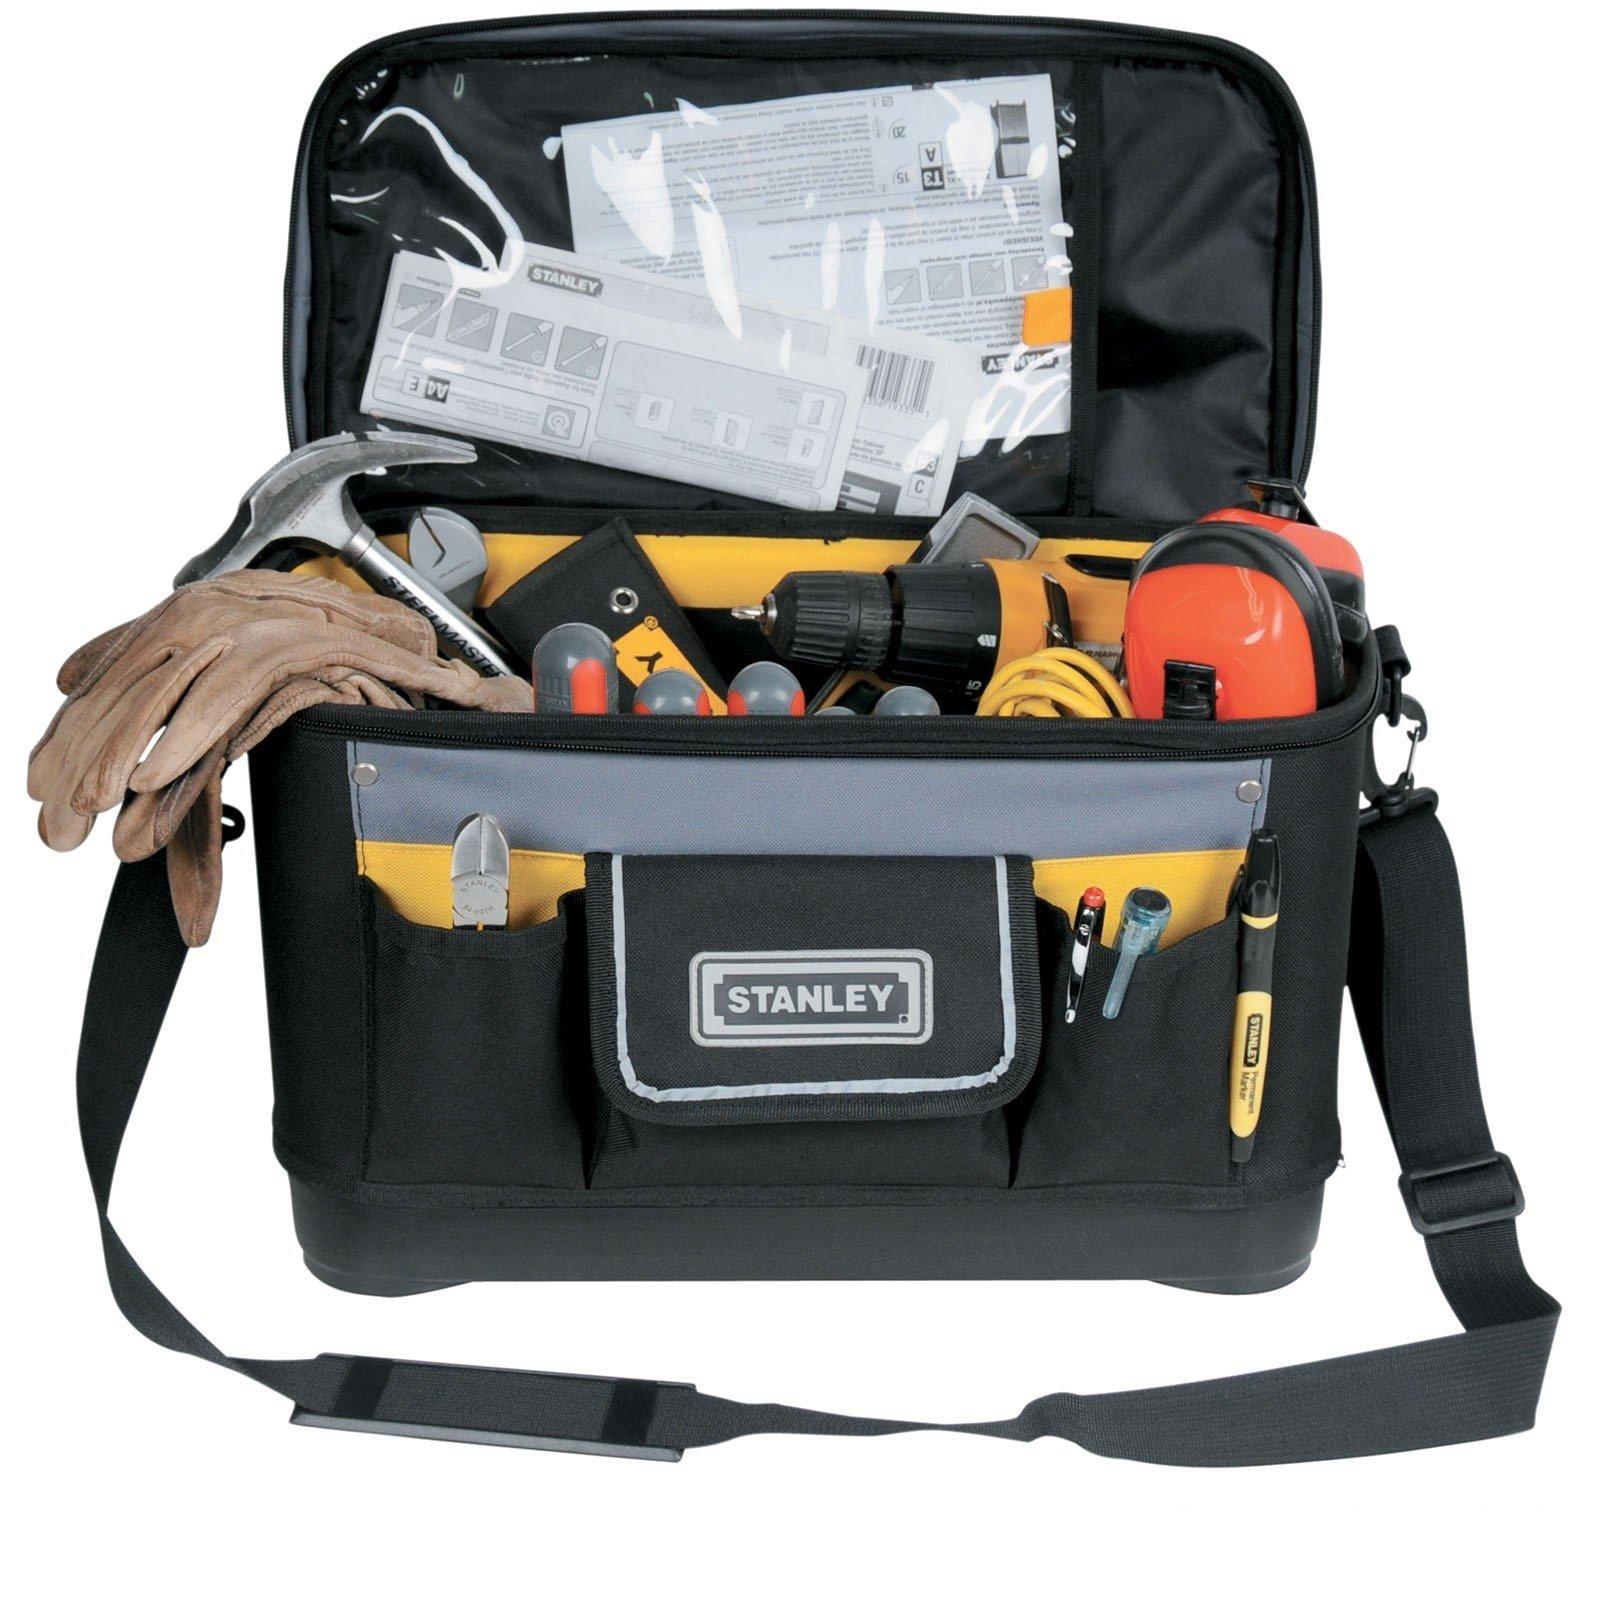 STANLEY 1-96-193 - Bolsa para herramientas con tapa plana, 44.7 x